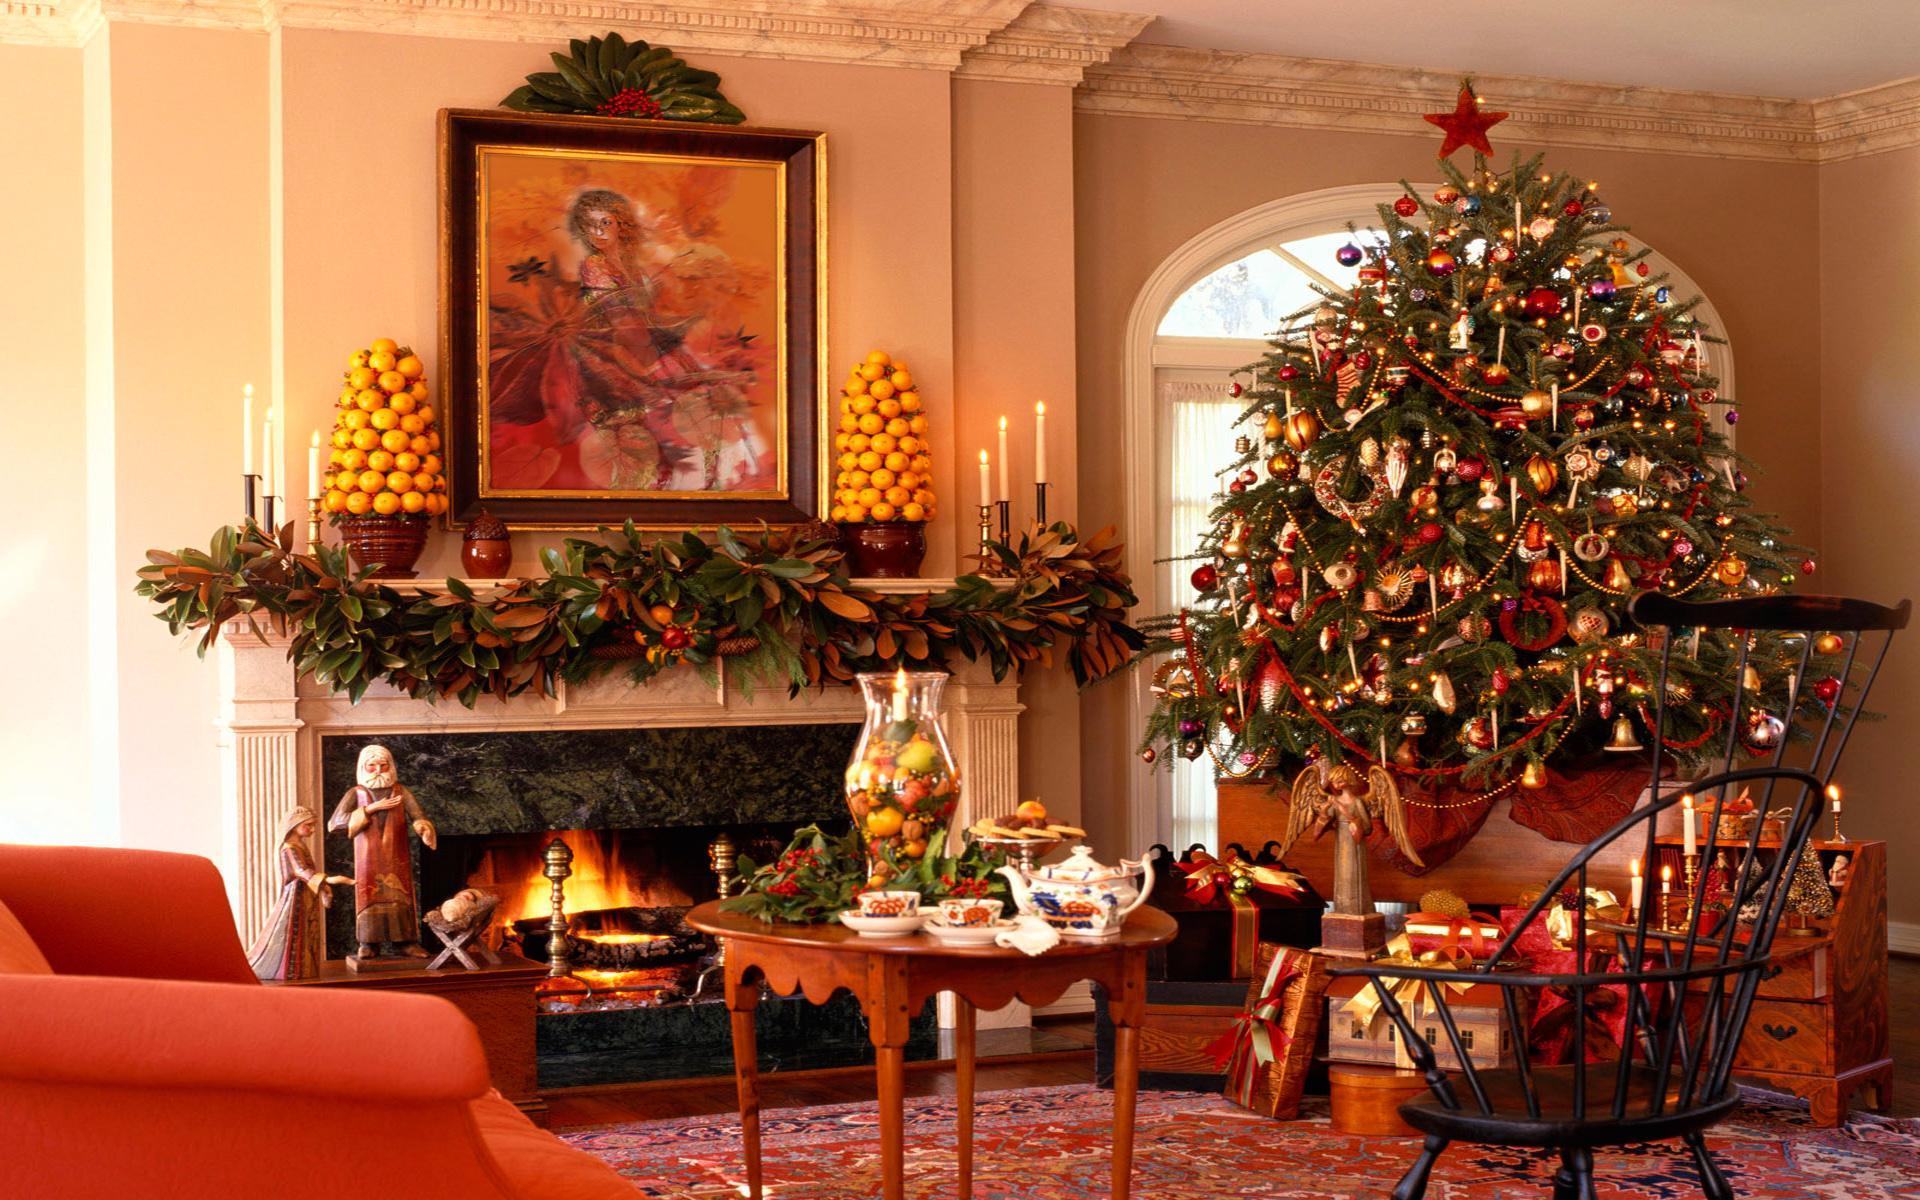 ys1rdxbllnj1interior_ornaments_of_a_room_for_visitors_009422_